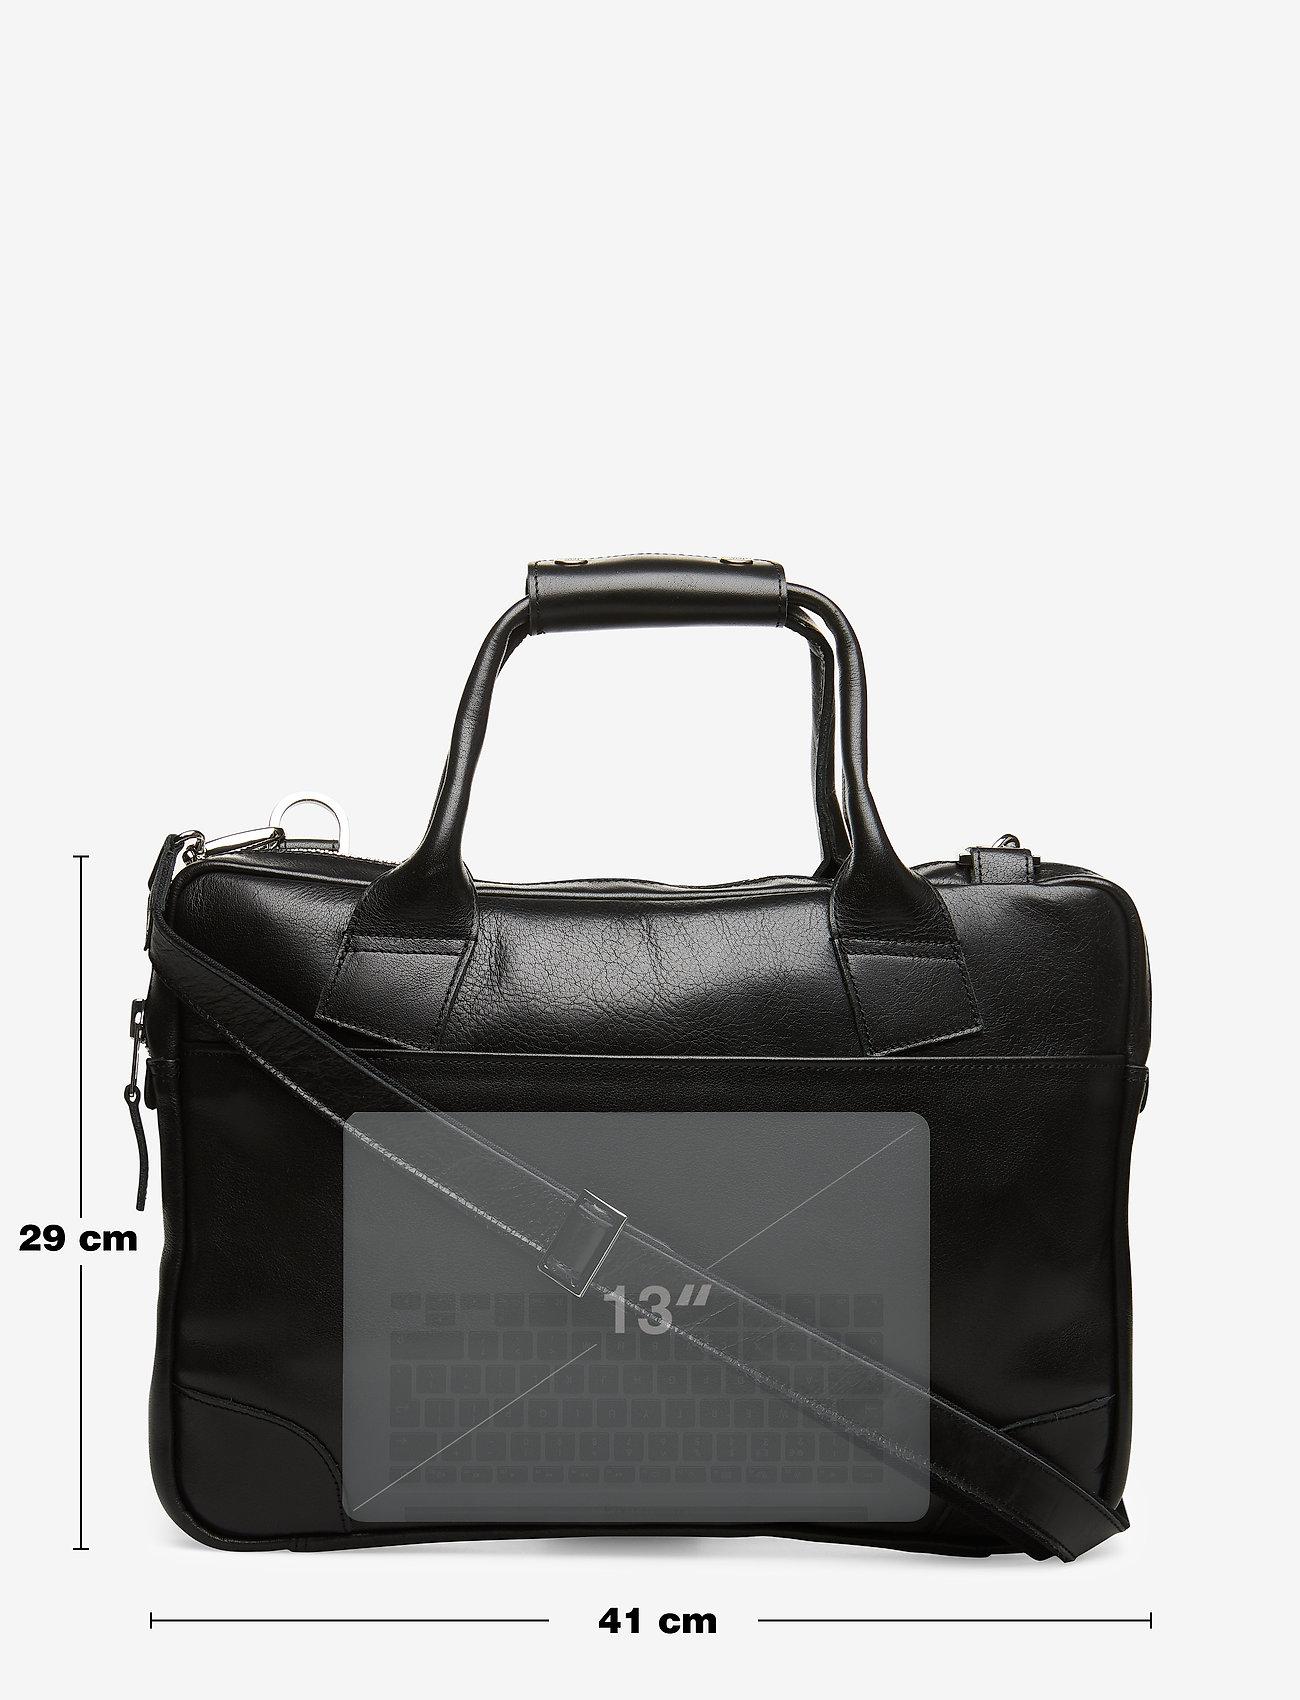 Royal RepubliQ Nano single bag - BLACK